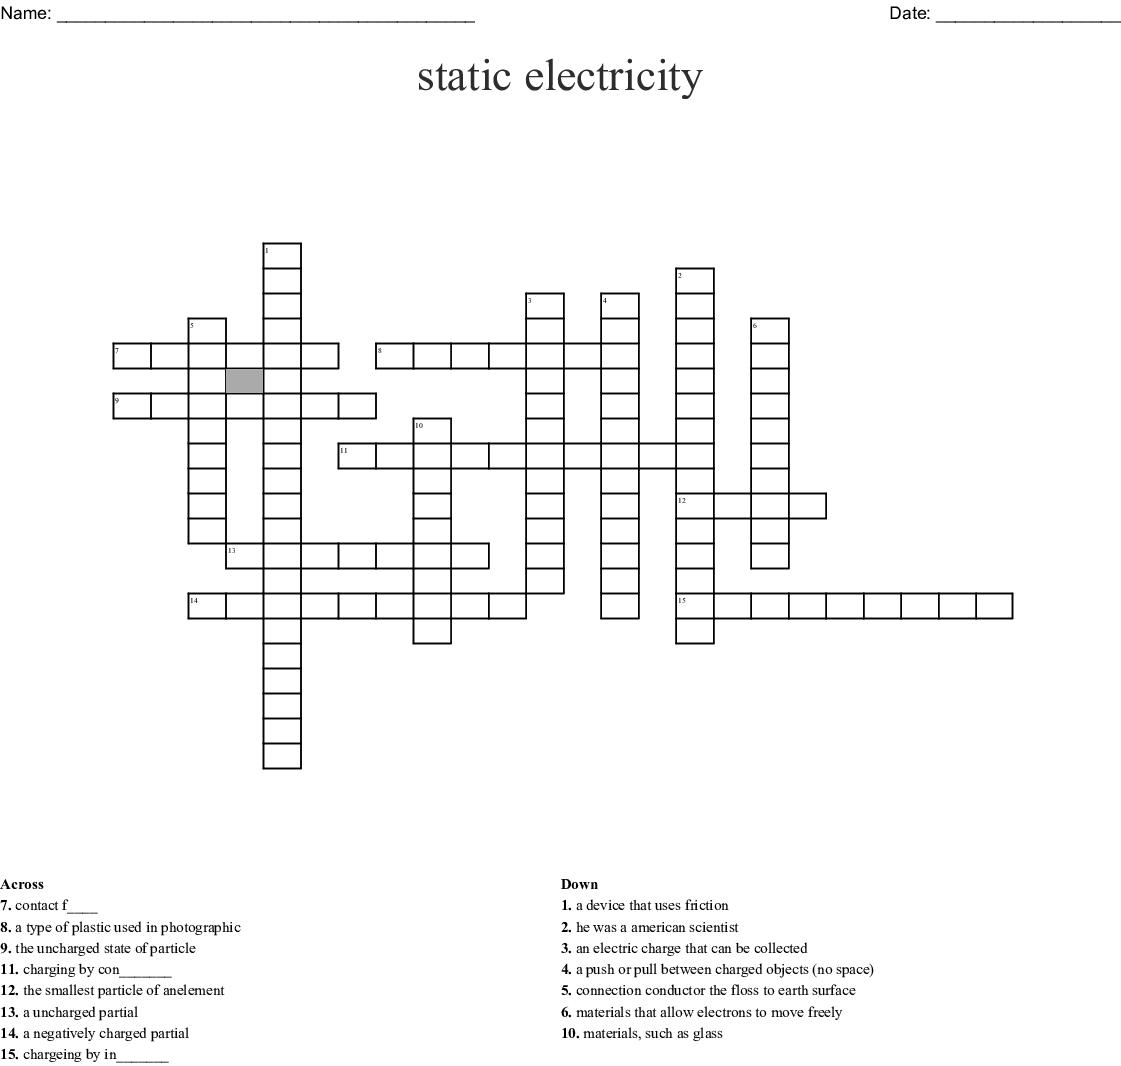 Static Electricity Crossword